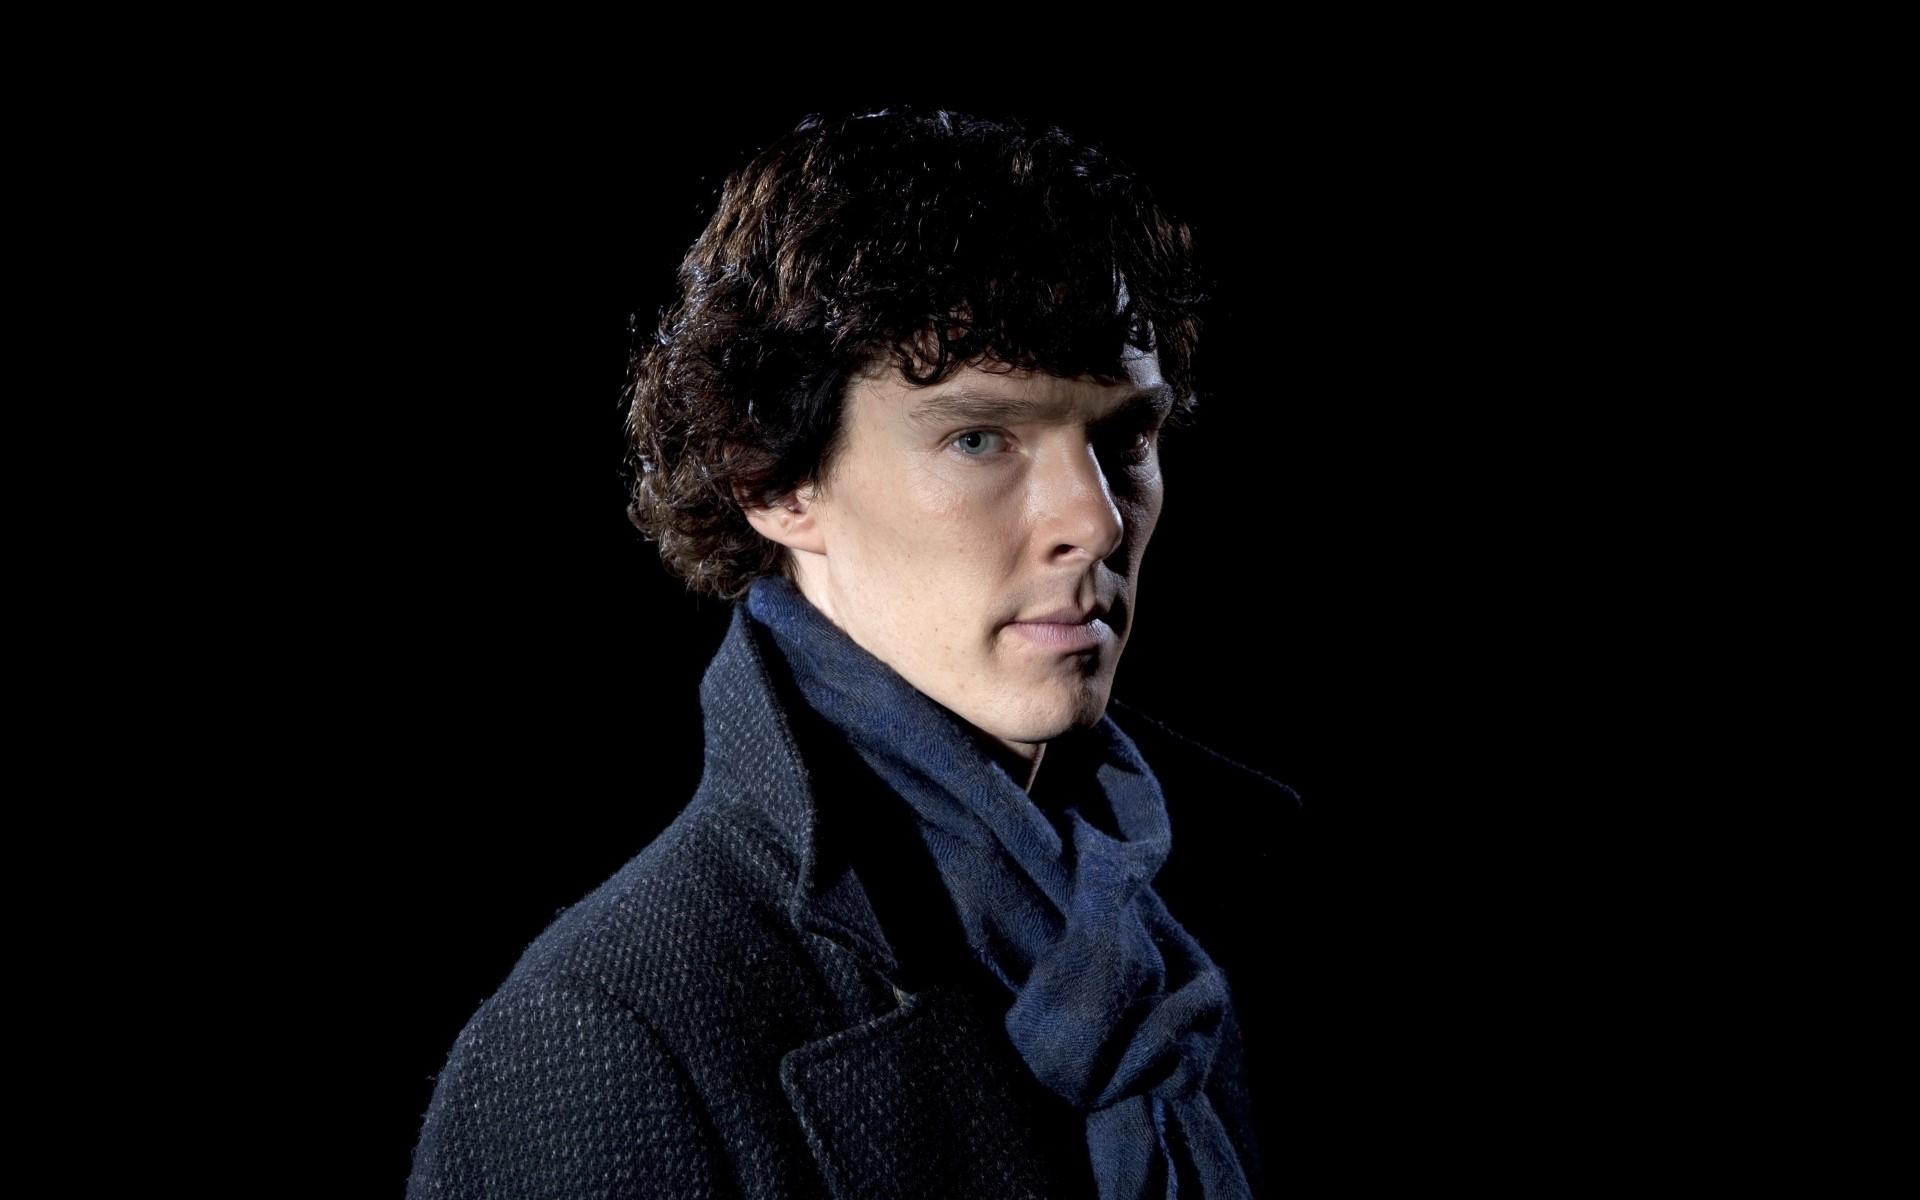 Benedict Cumberbatch Wallpapers for Computer